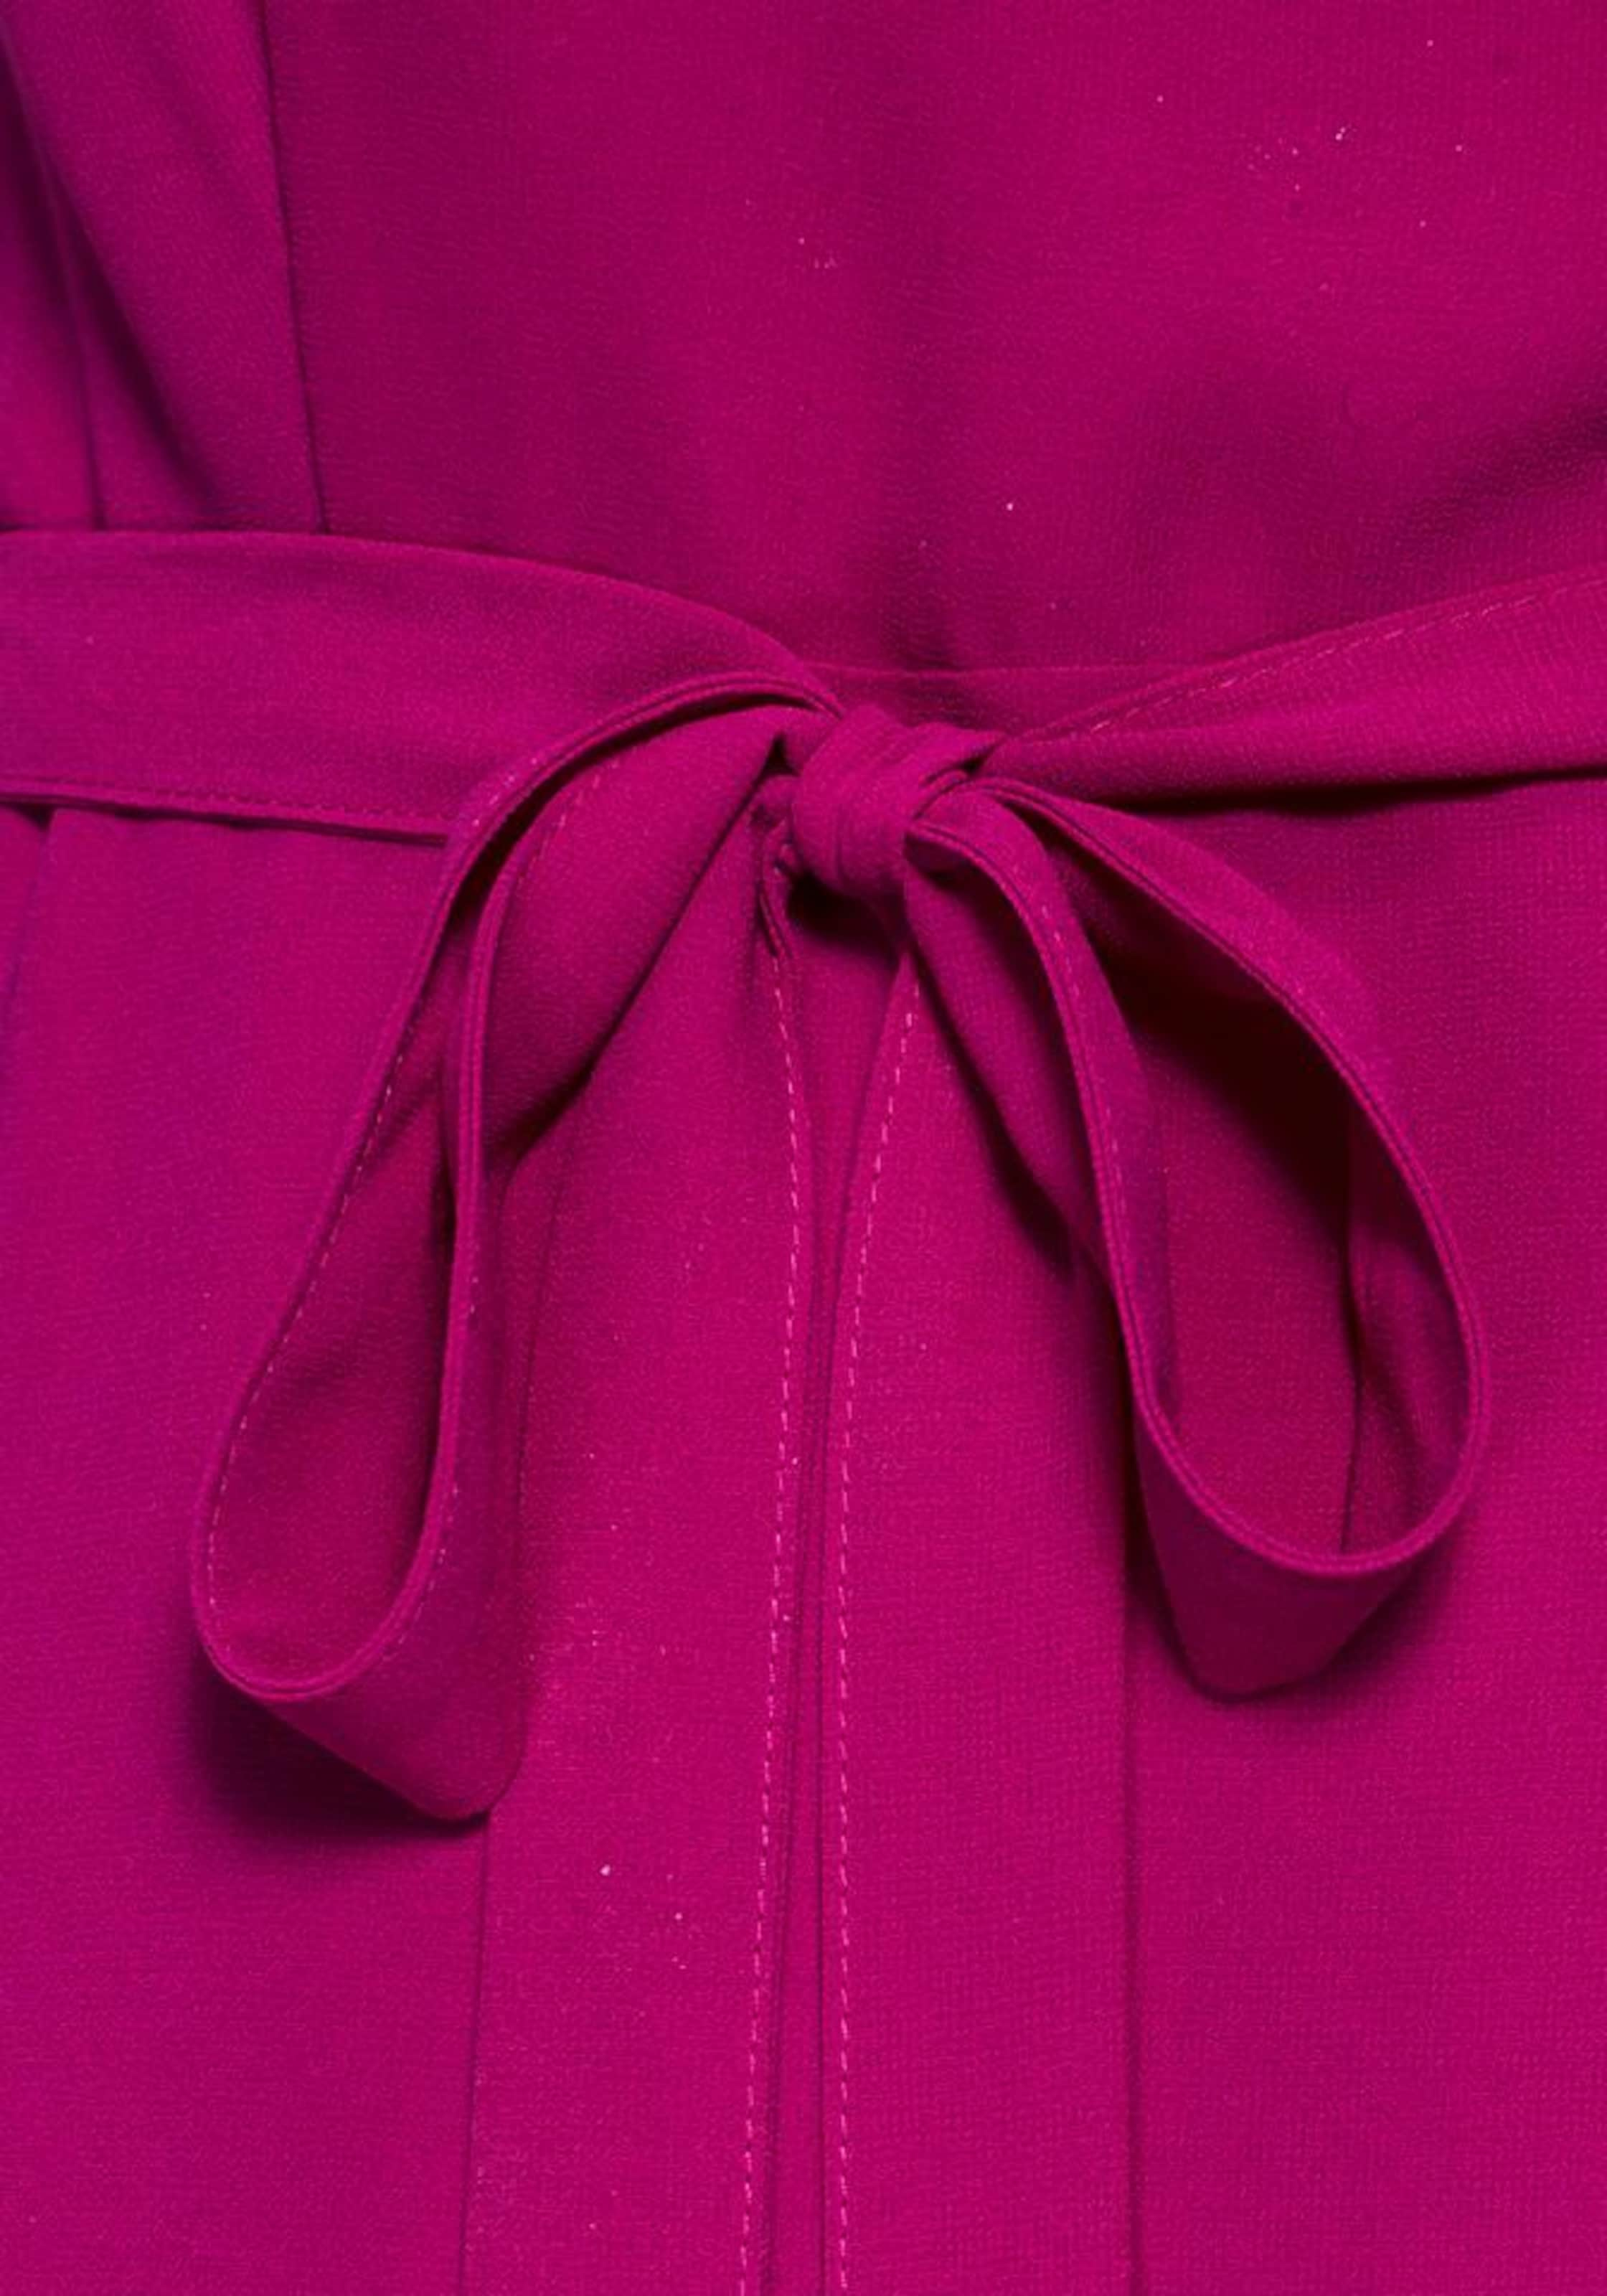 Kretschmer In Fuchsia Kleid Maria Guido 2YIEDH9W